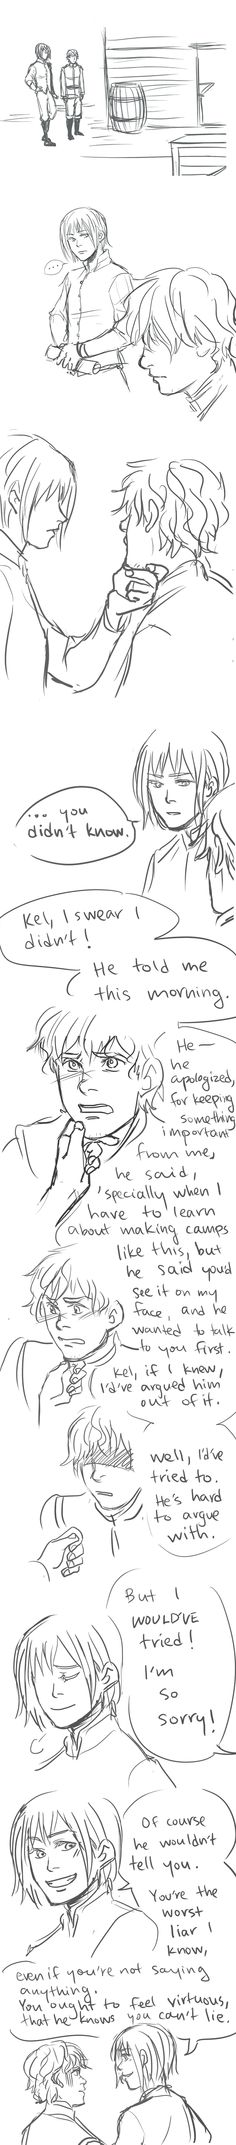 Kel and Owen's conversation from Lady Knight by Tamora Pierce --drawn by Minuiko